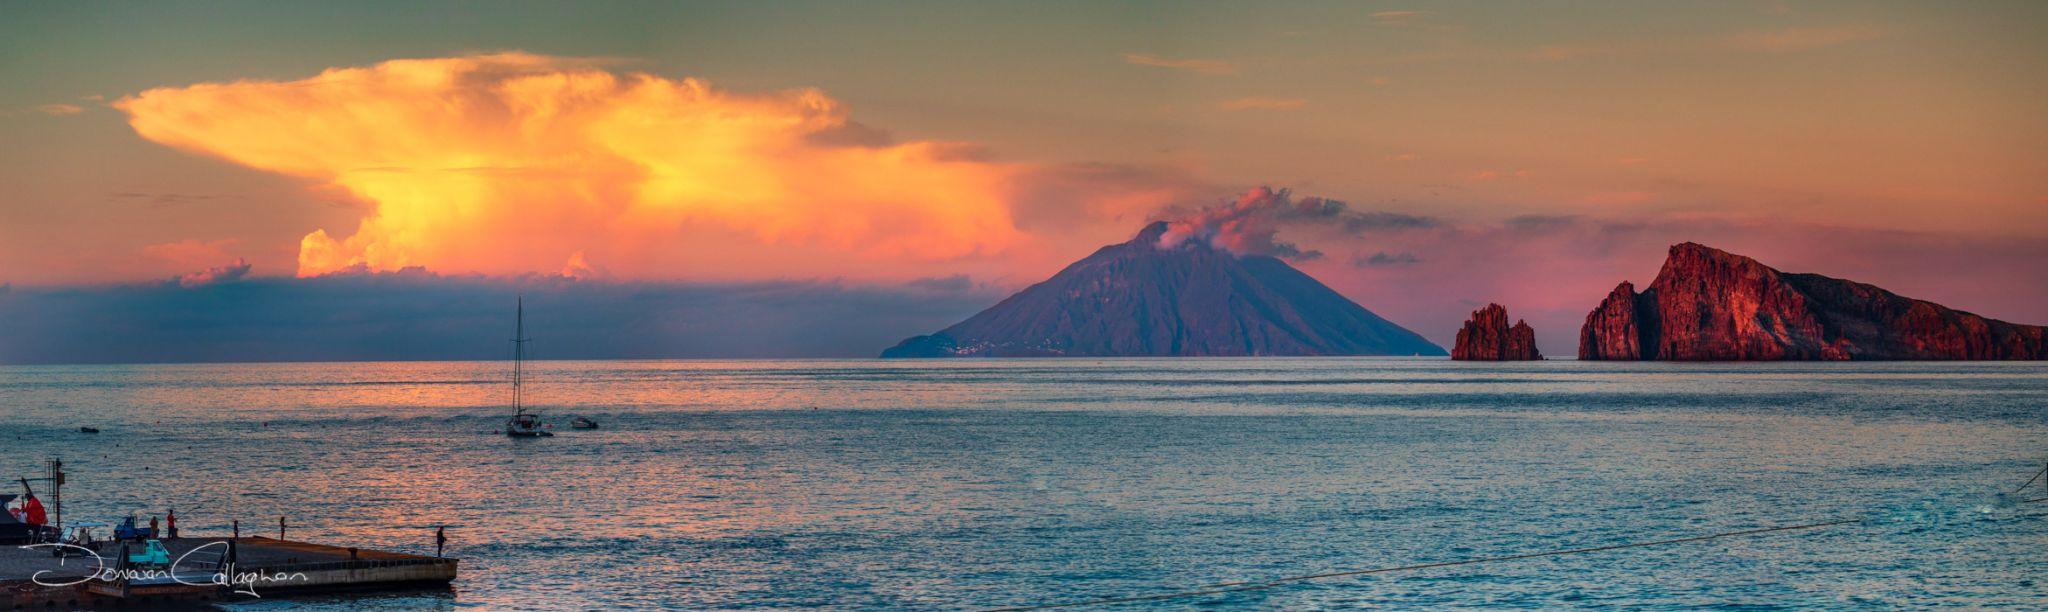 Sunset Stomboli from Panarea Italy, Italy